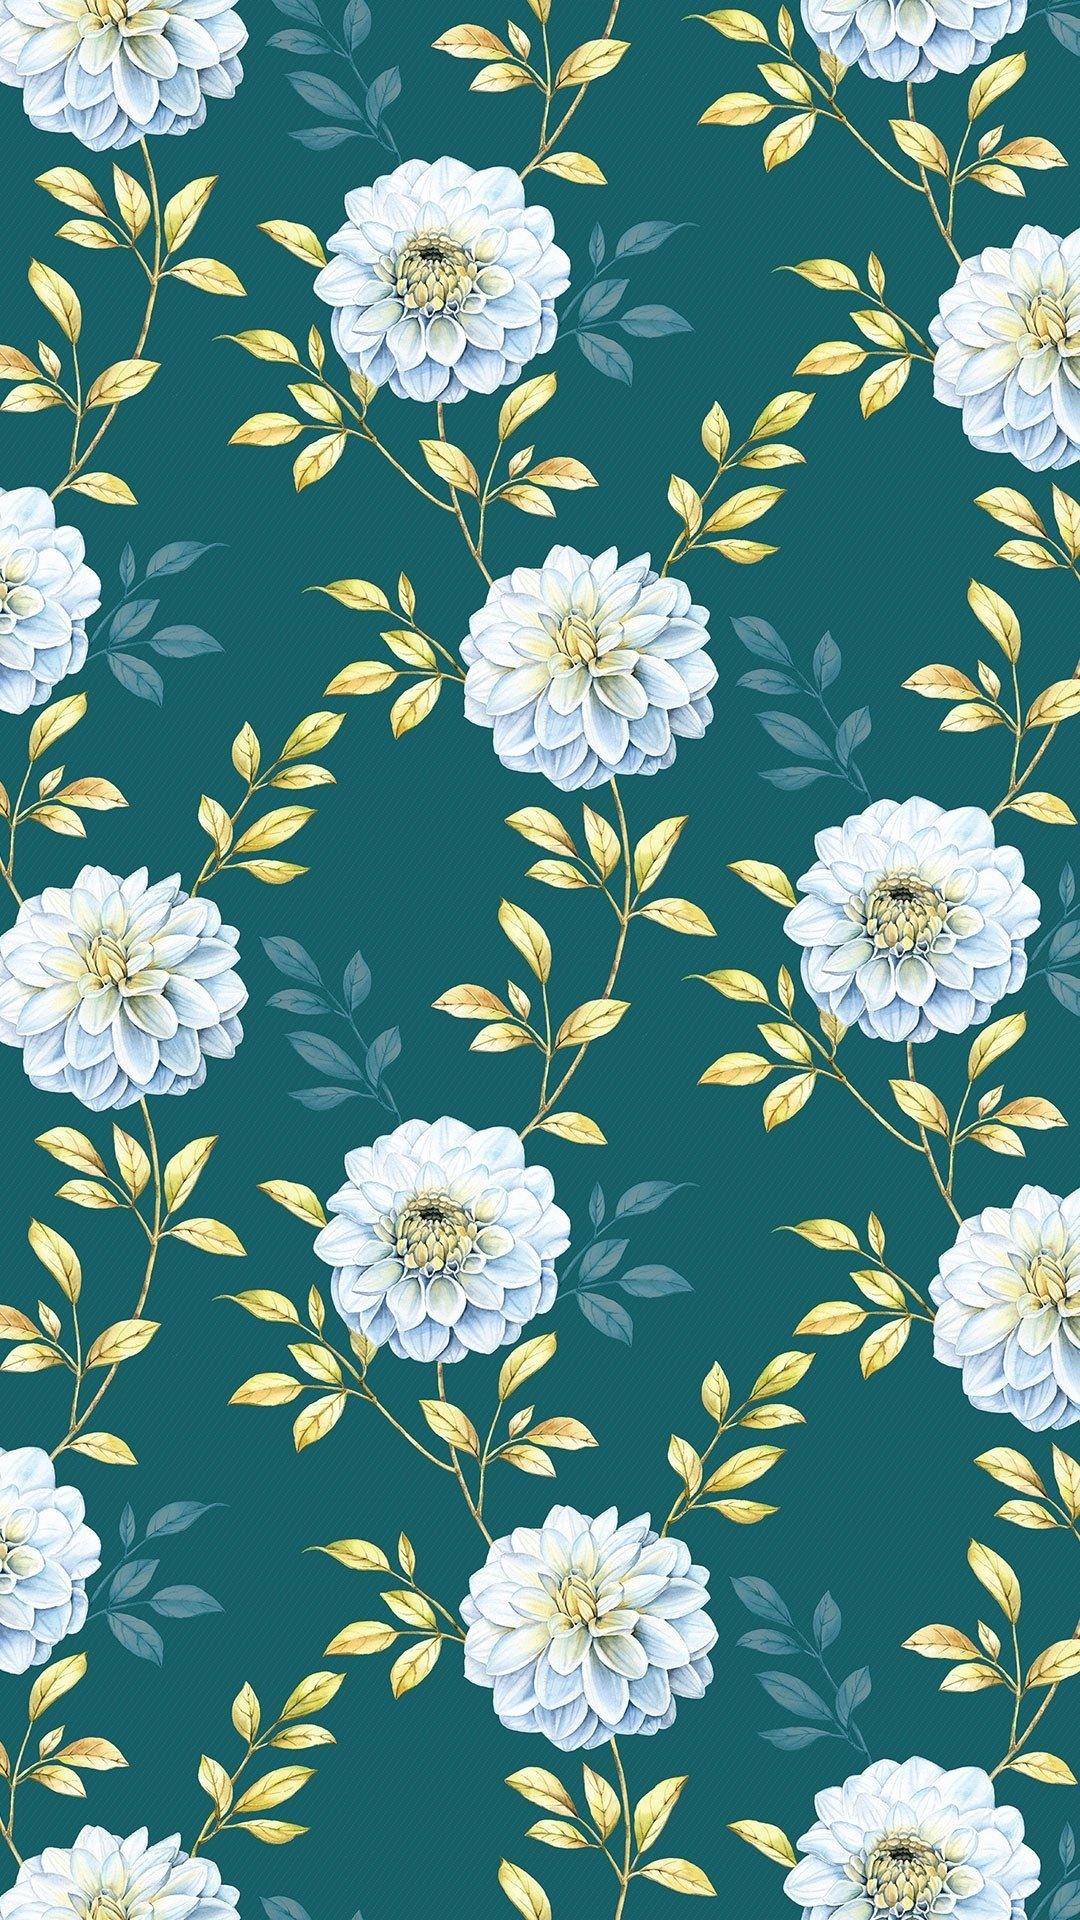 Floral iphone 8 plus wallpaper